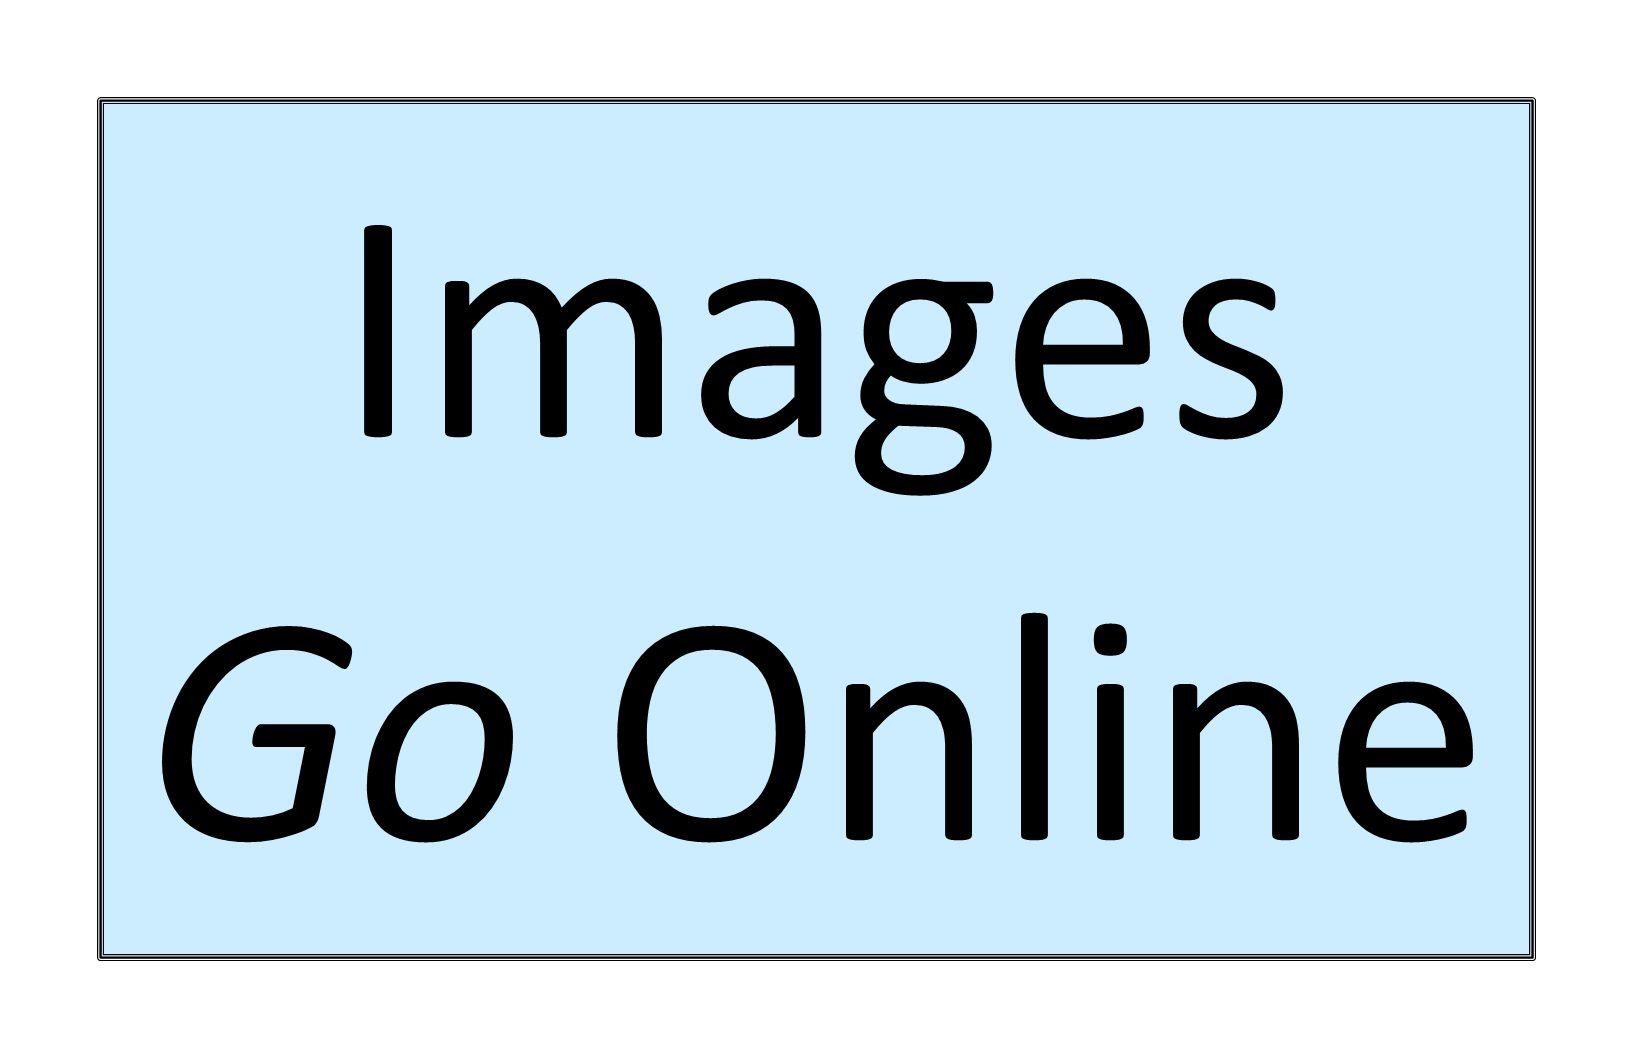 Images Go Online